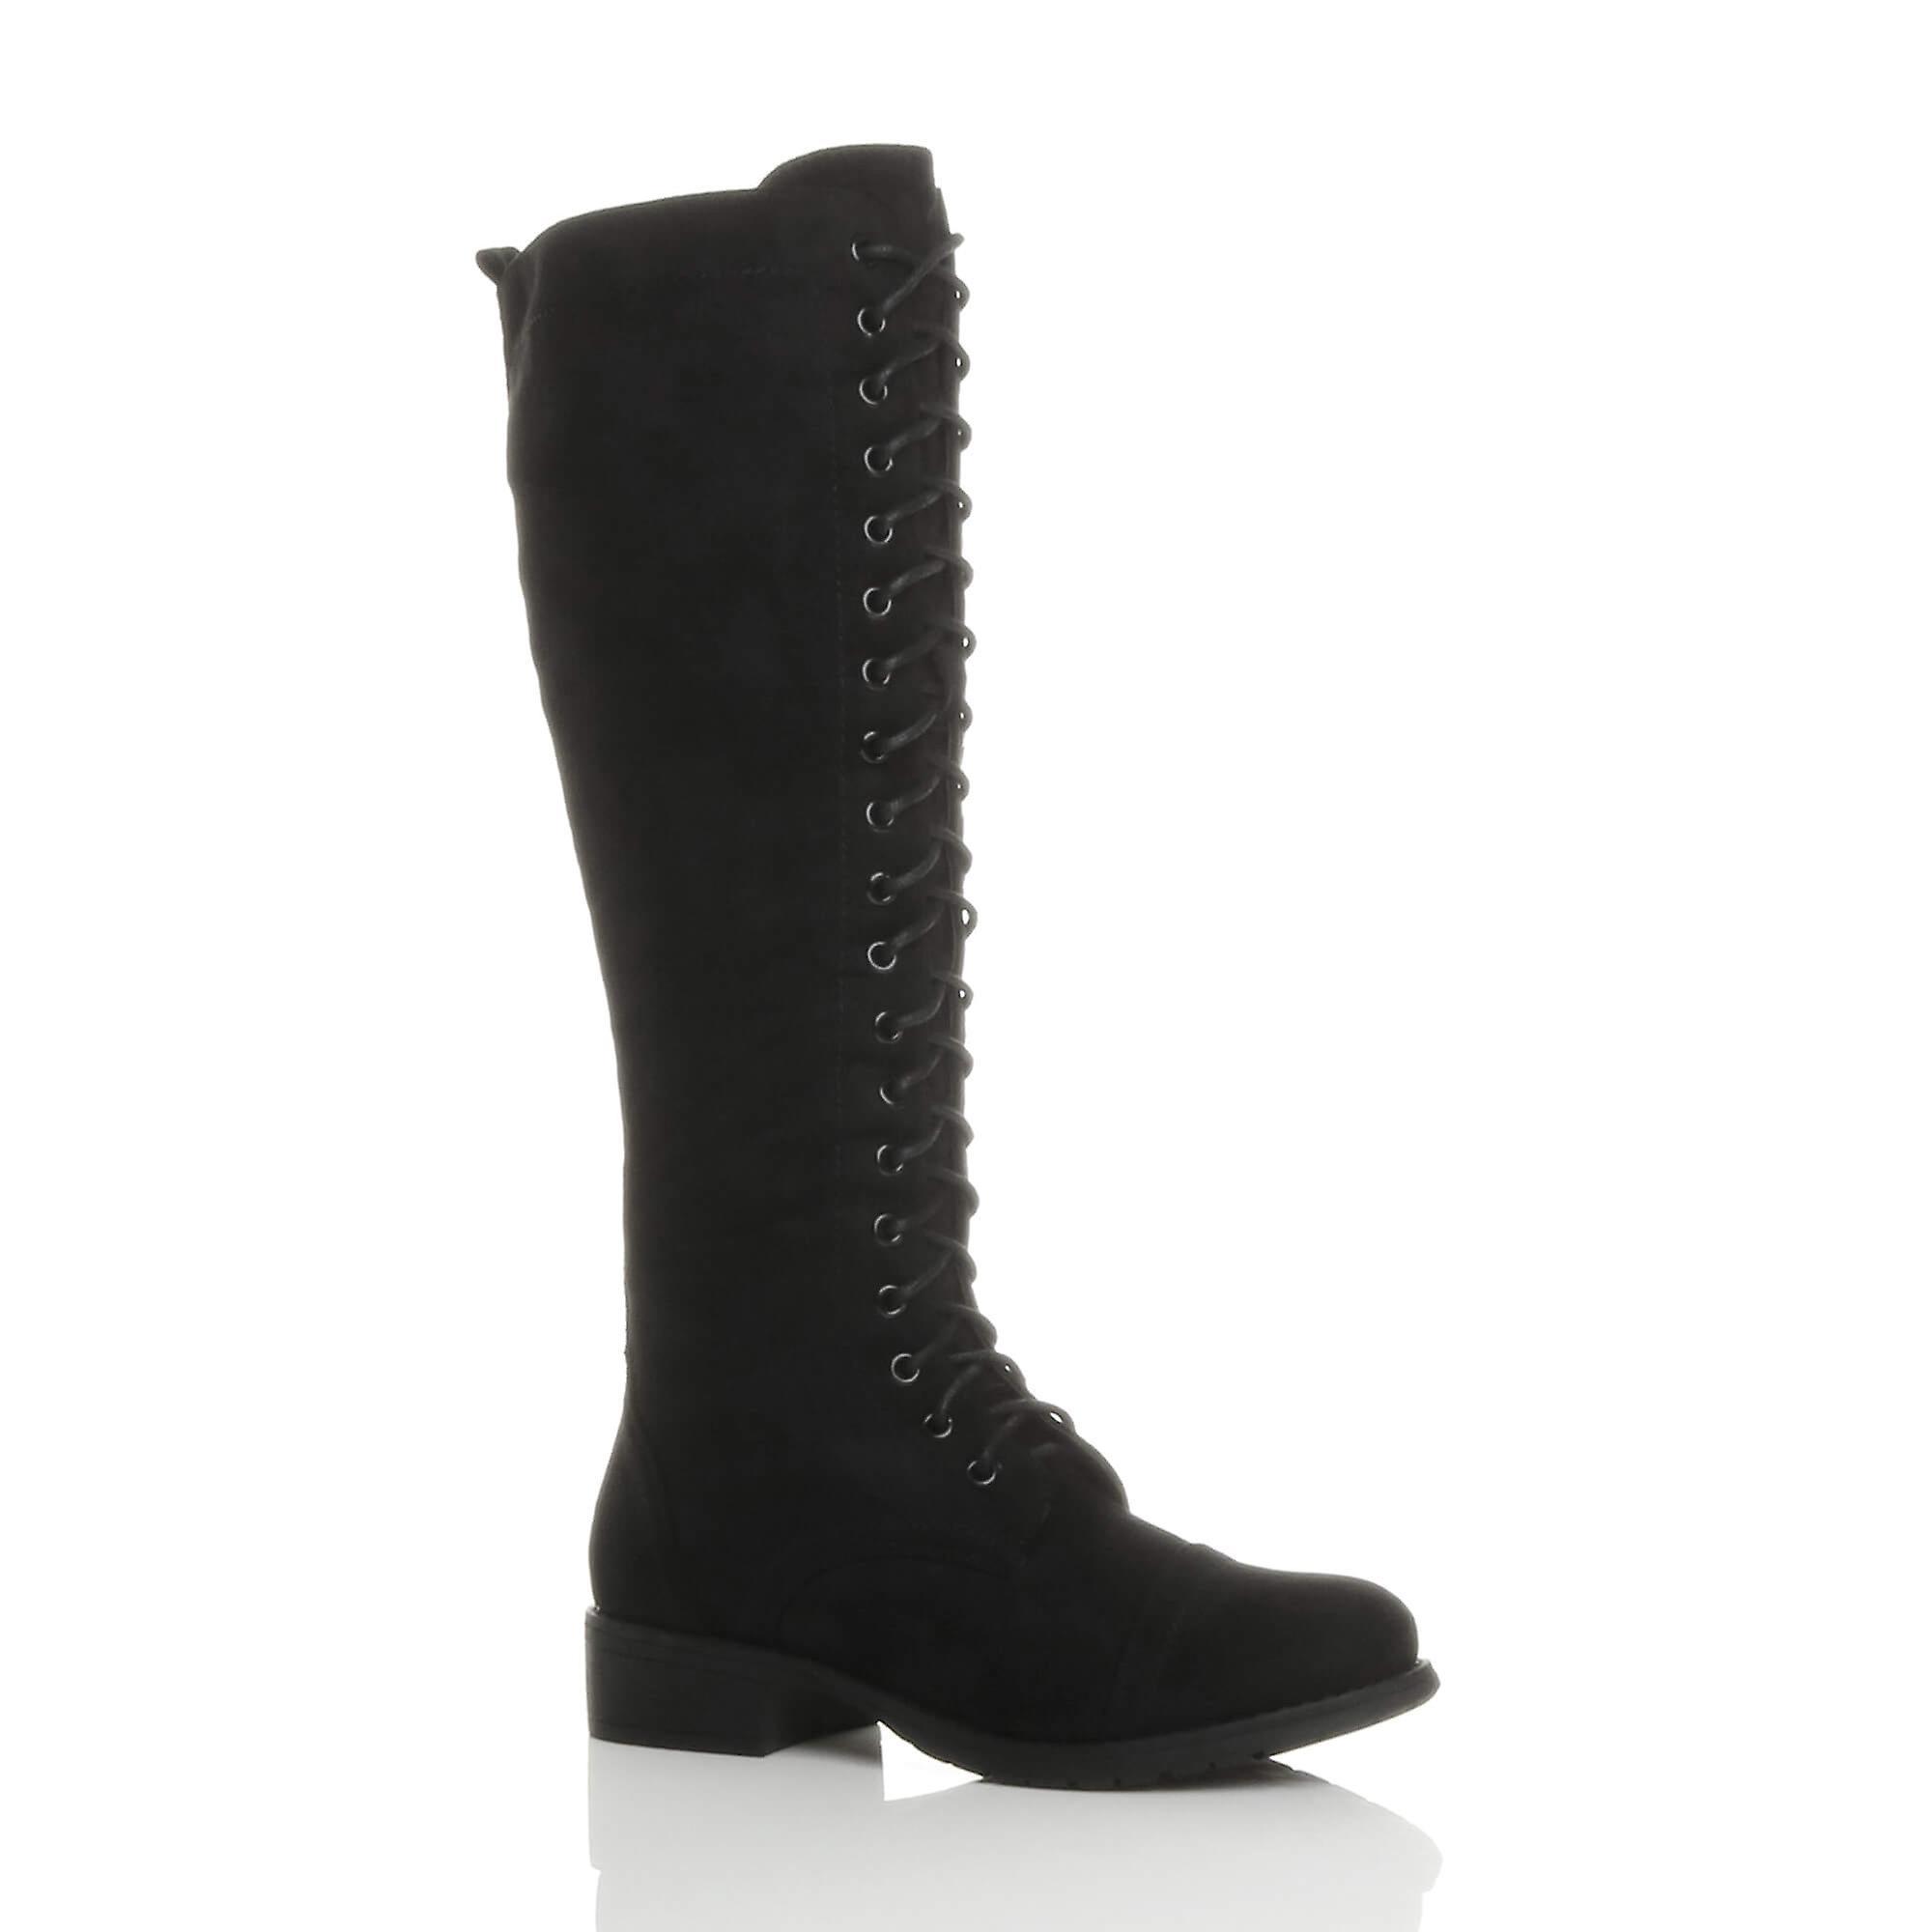 1bb856494f3 Ajvani womens low block heel lace up zip knee high calf biker army military  boots